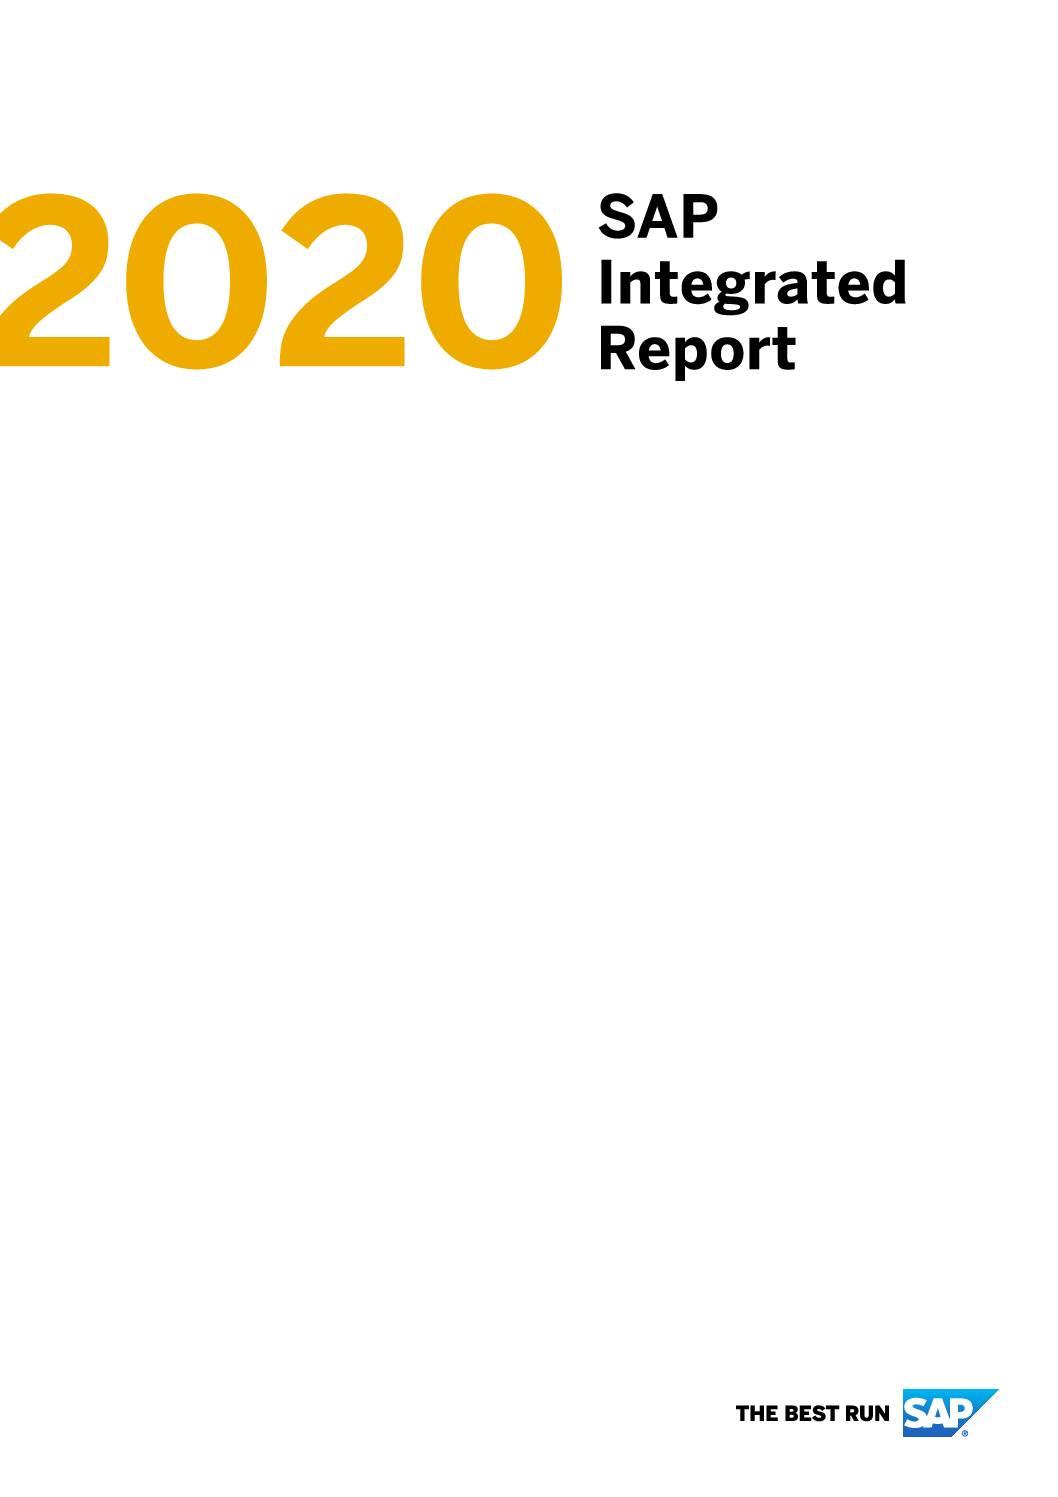 SAP 2020 Integrated Report